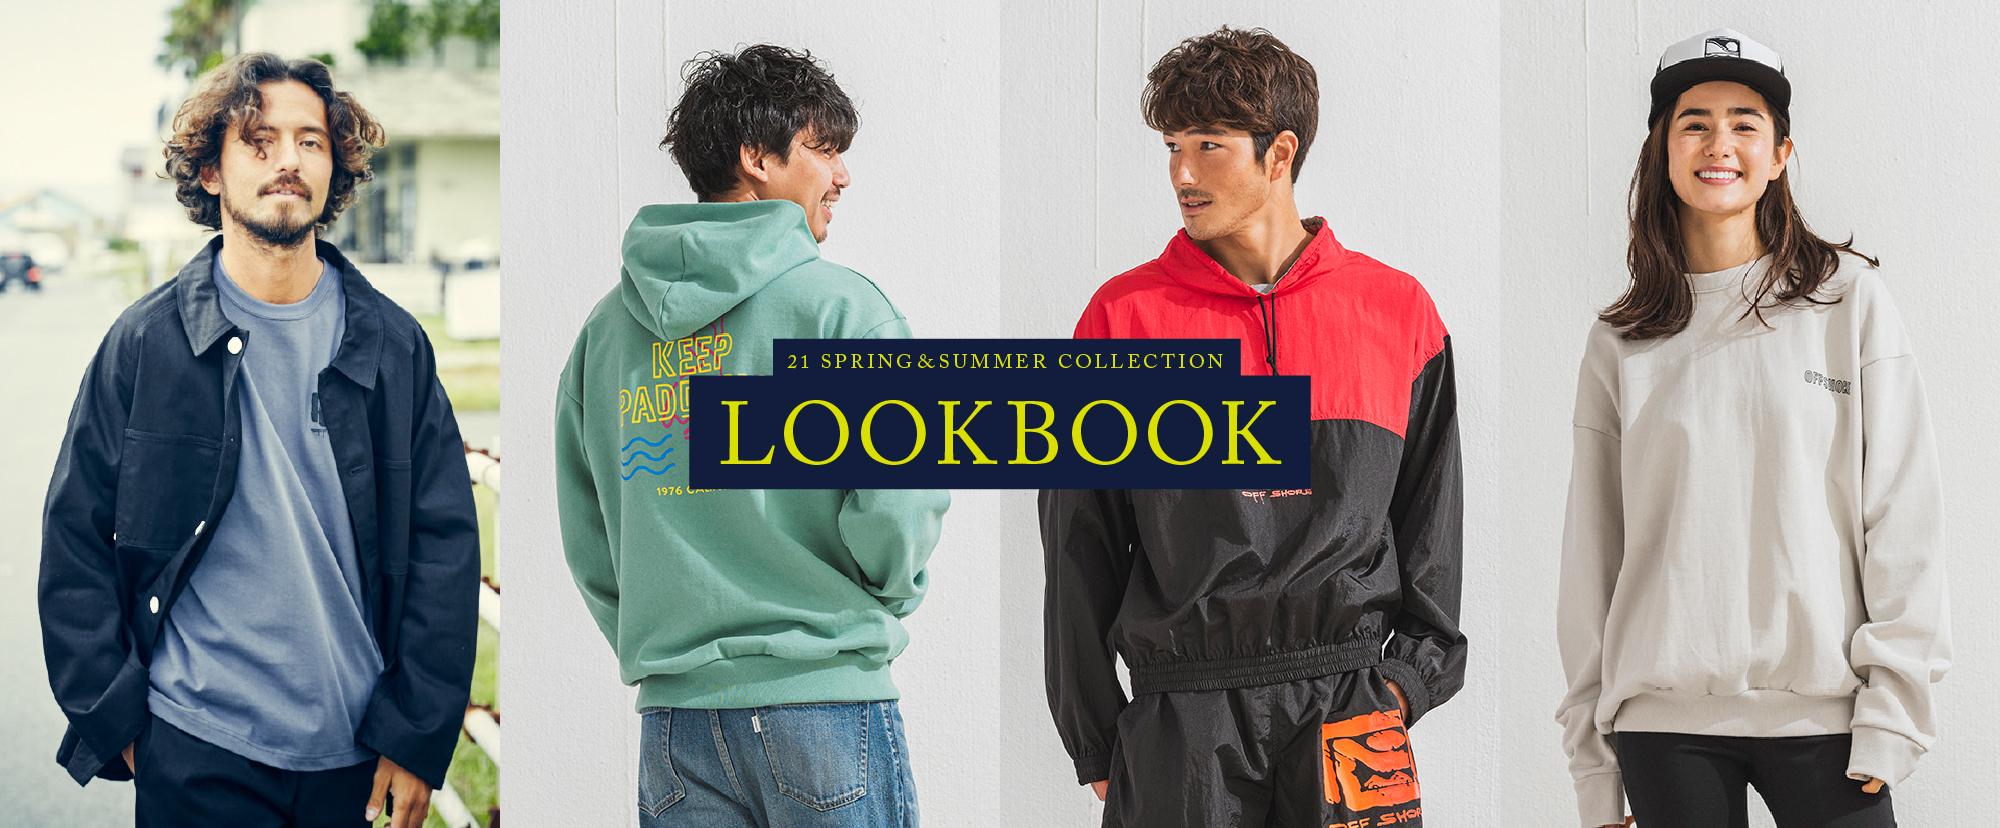 web_lookbook.jpg